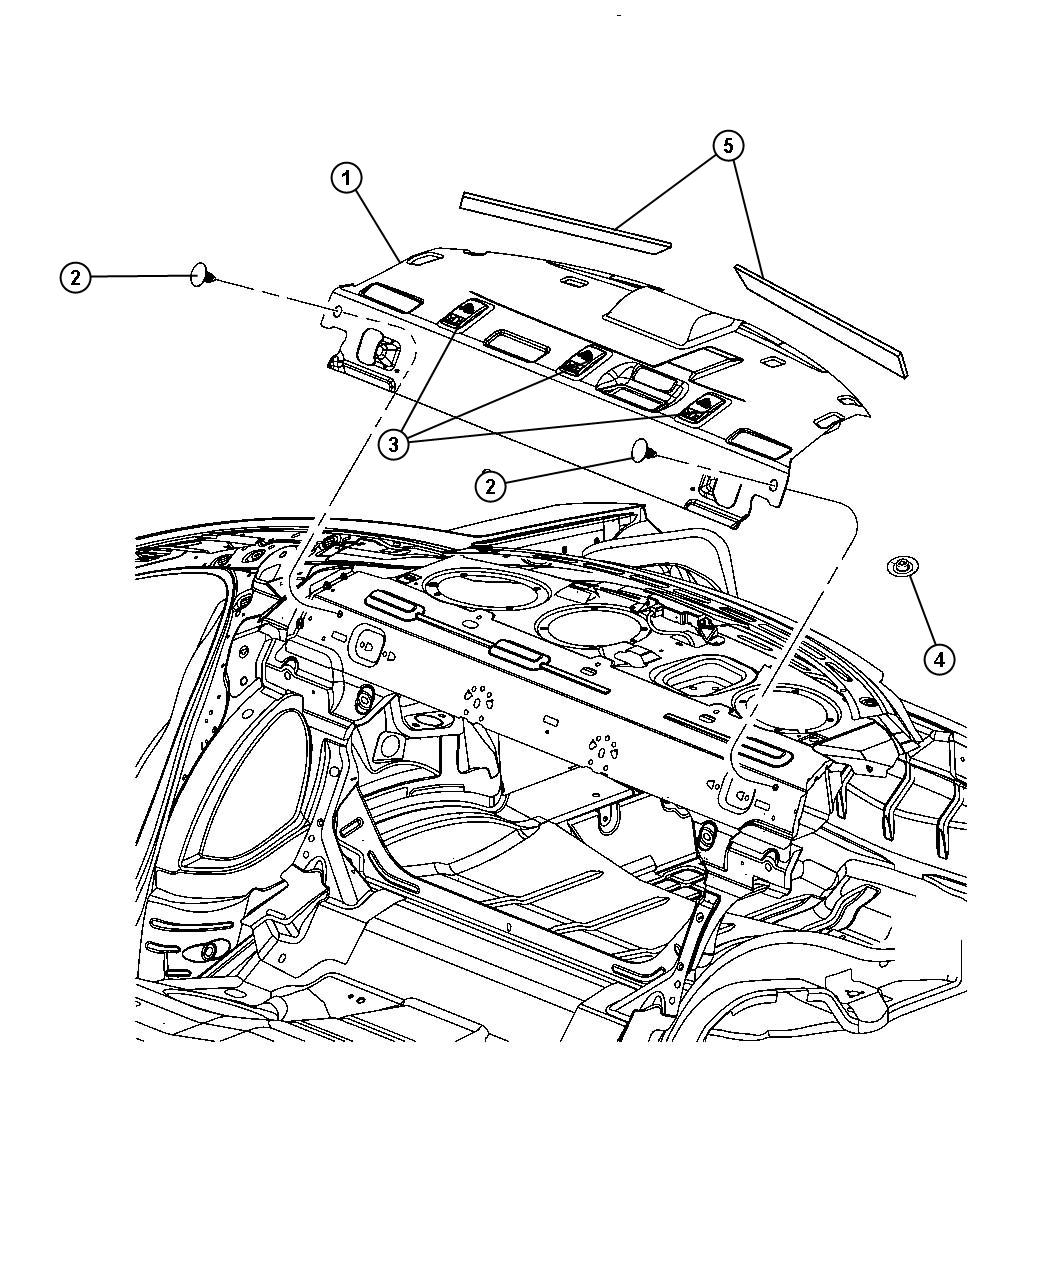 Dodge Magnum Panel Rear Shelf Db Db Rear 60 40